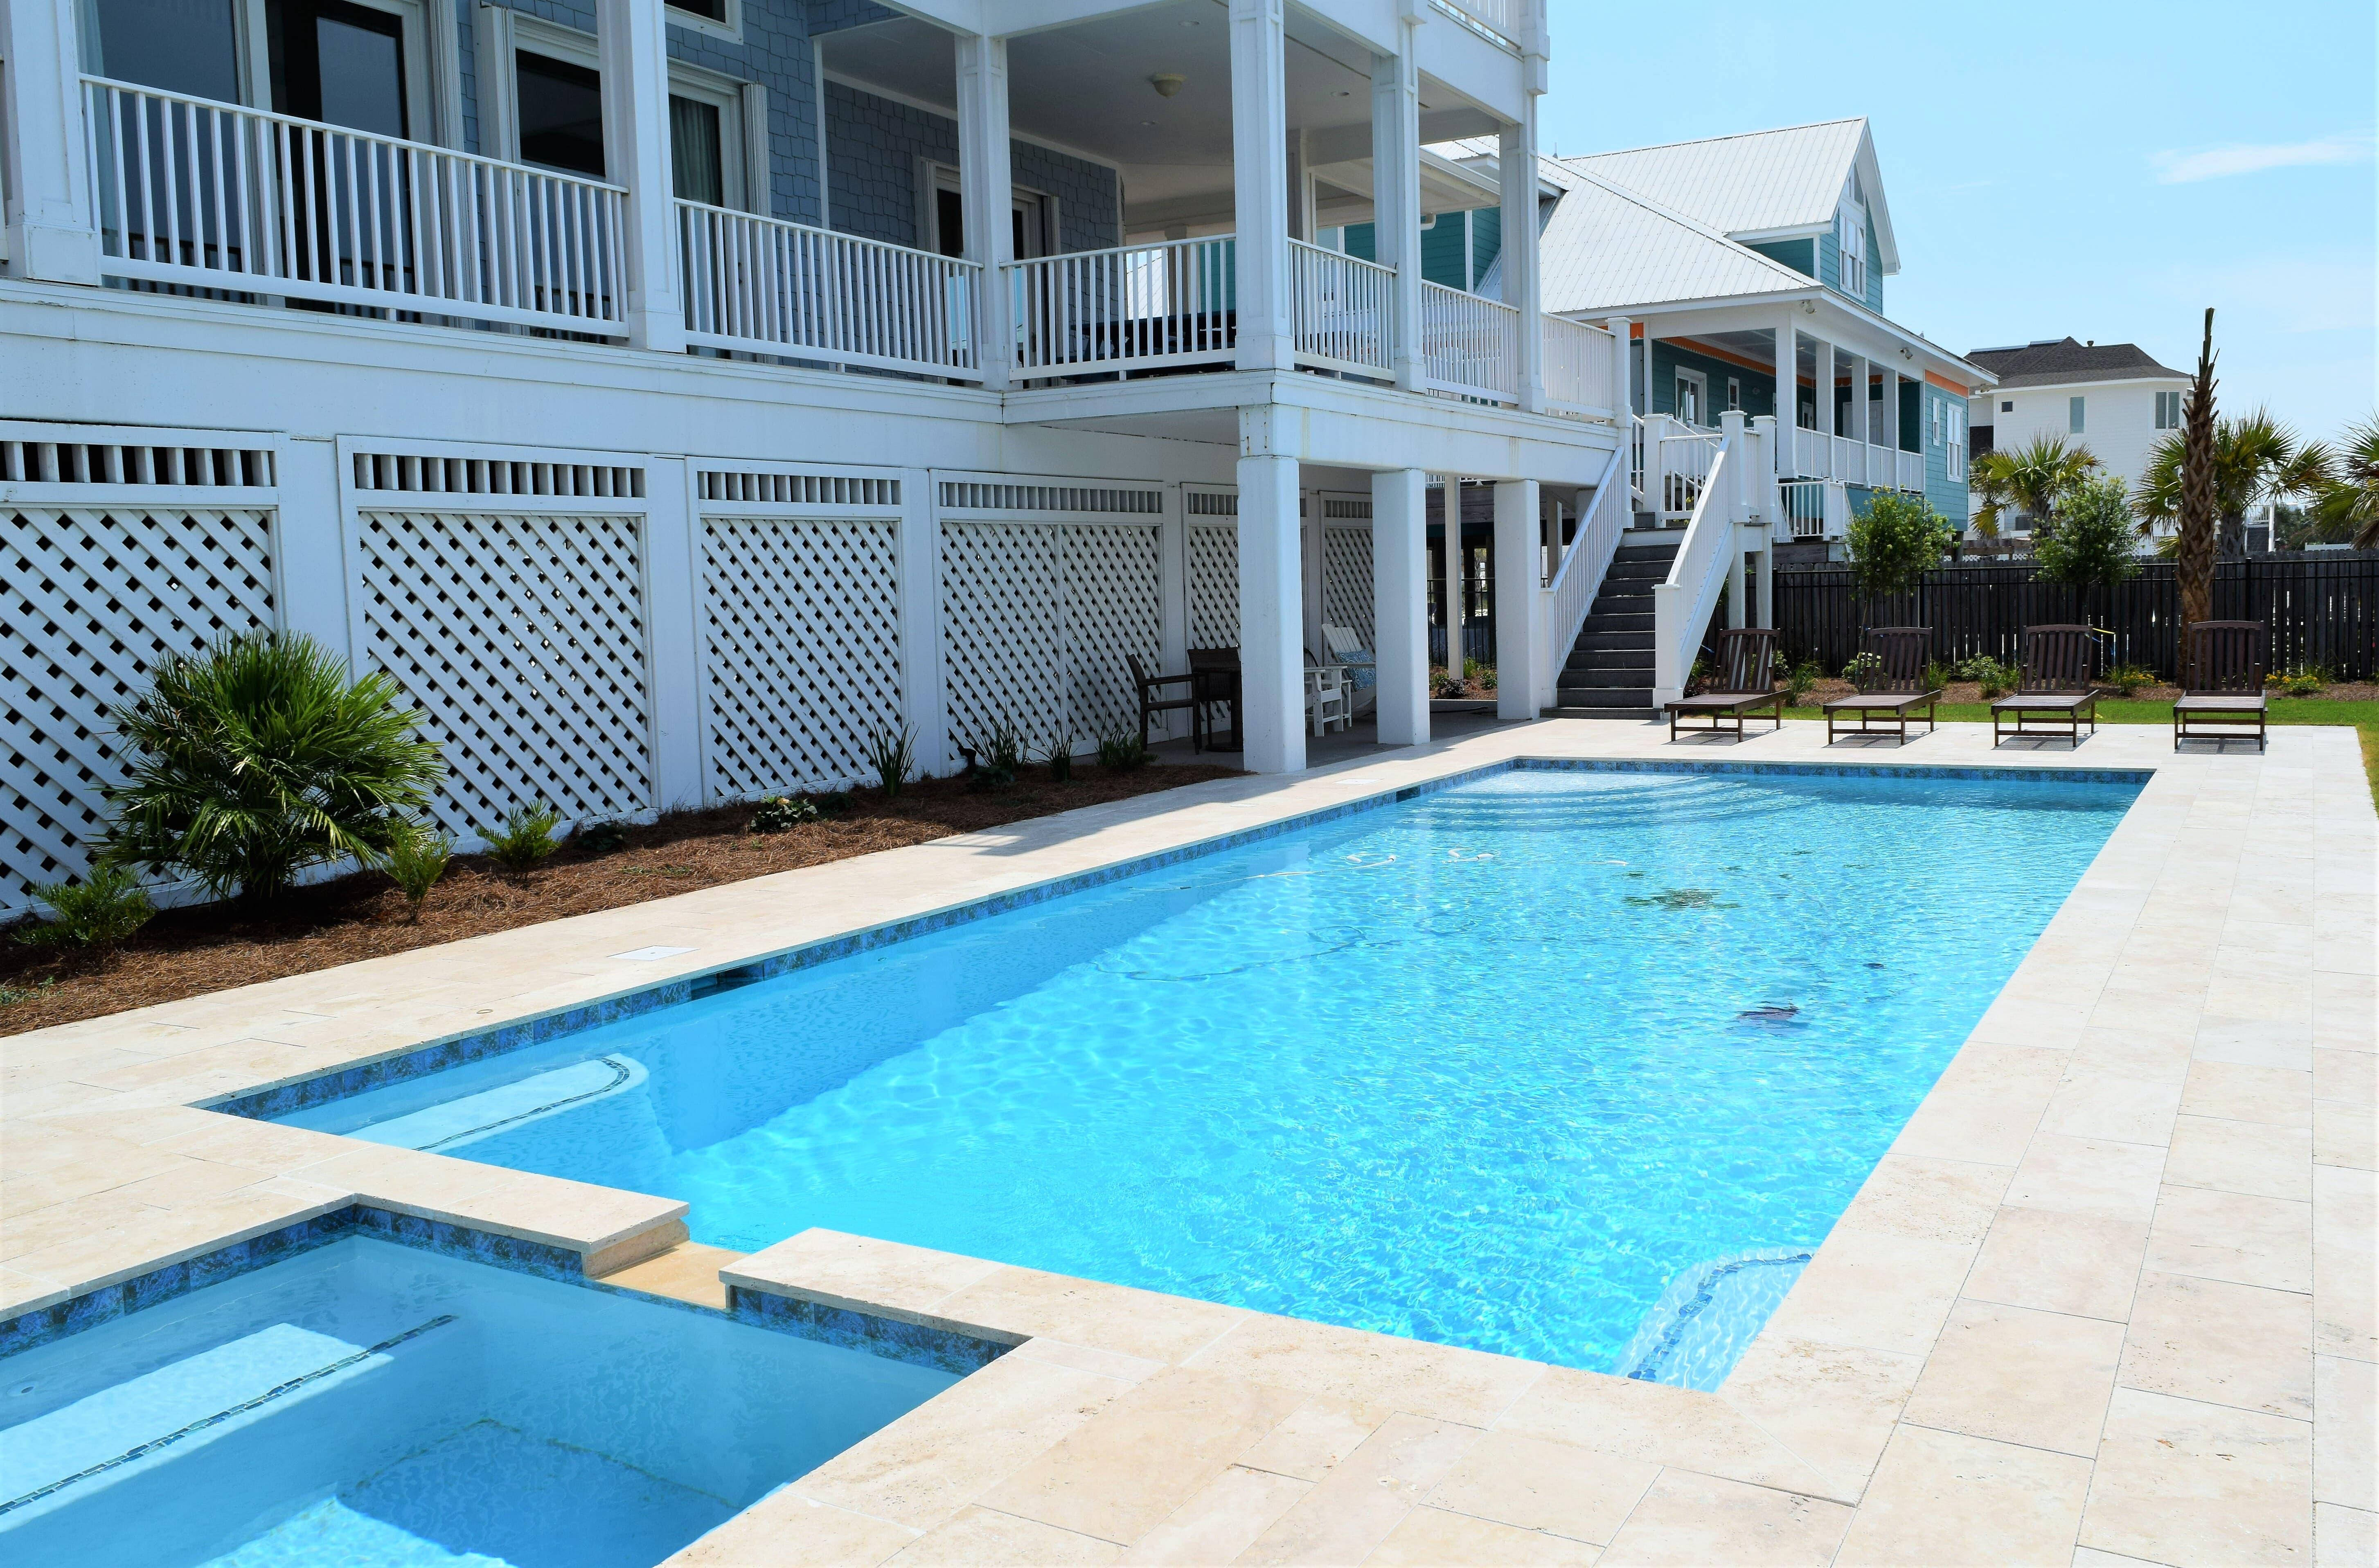 Ariola 1313 House/Cottage rental in Pensacola Beach House Rentals in Pensacola Beach Florida - #2